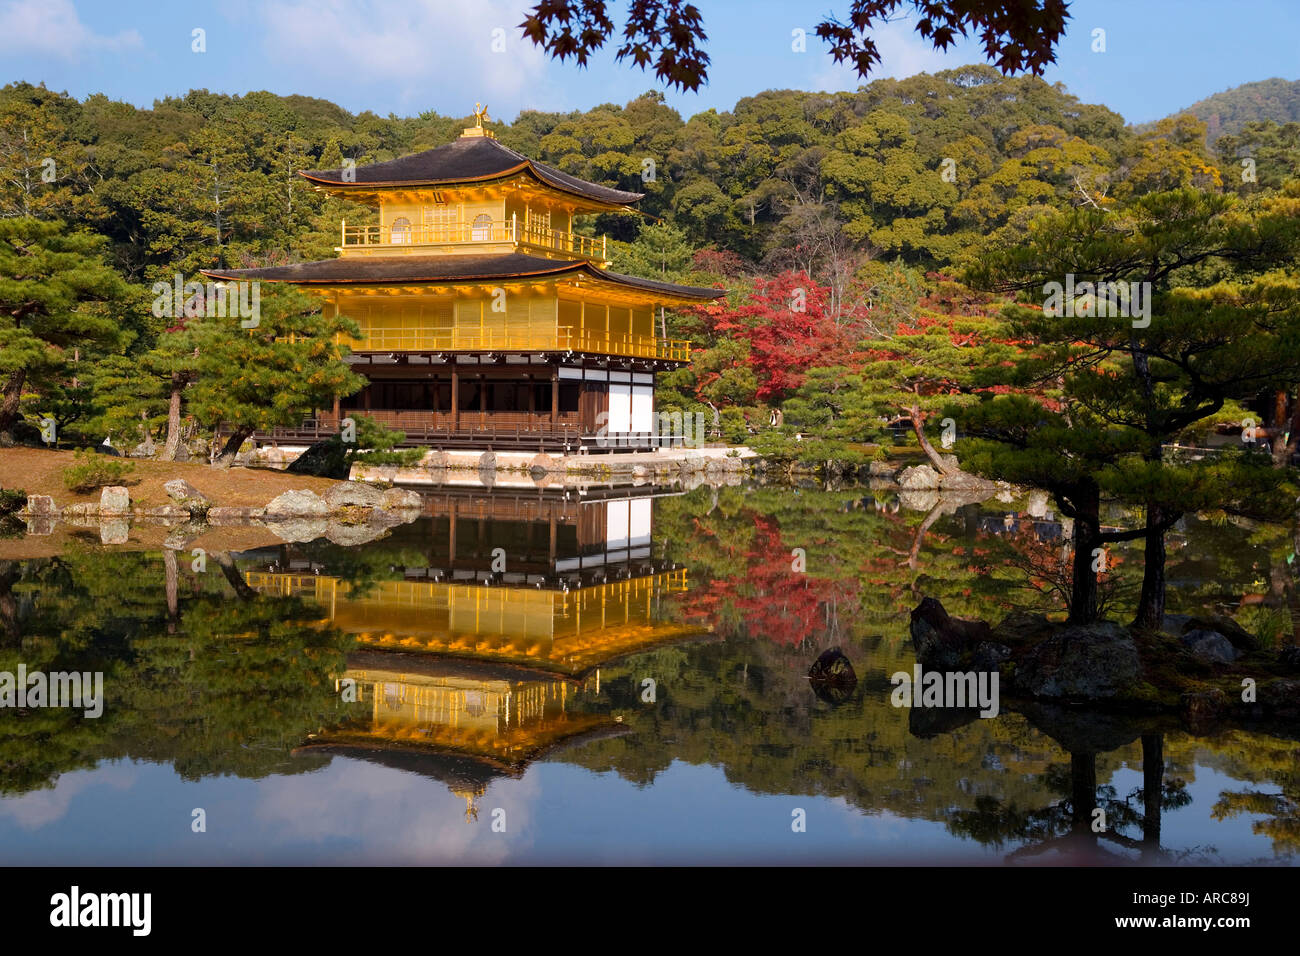 Kinkaku-ji (The Golden Pavilion), Kyoto, Kansai region, Honshu, Japan - Stock Image